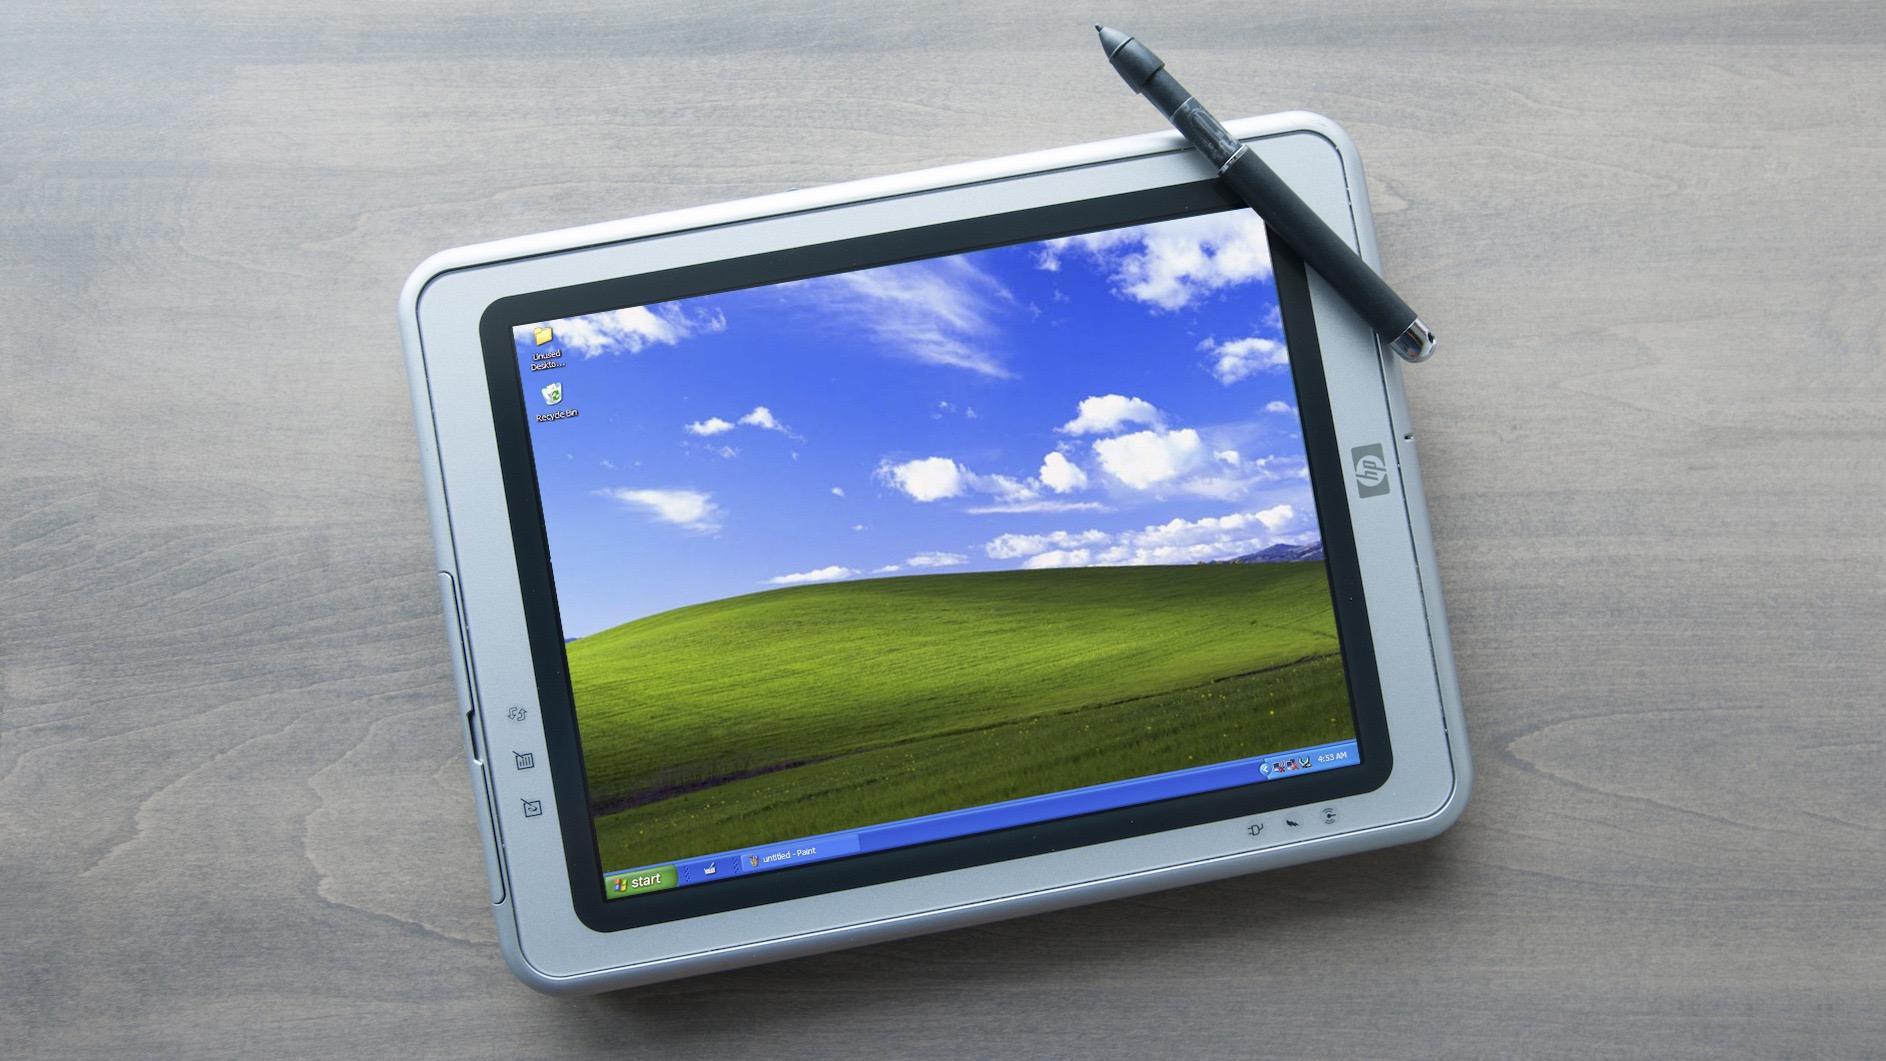 Windows XP tablet